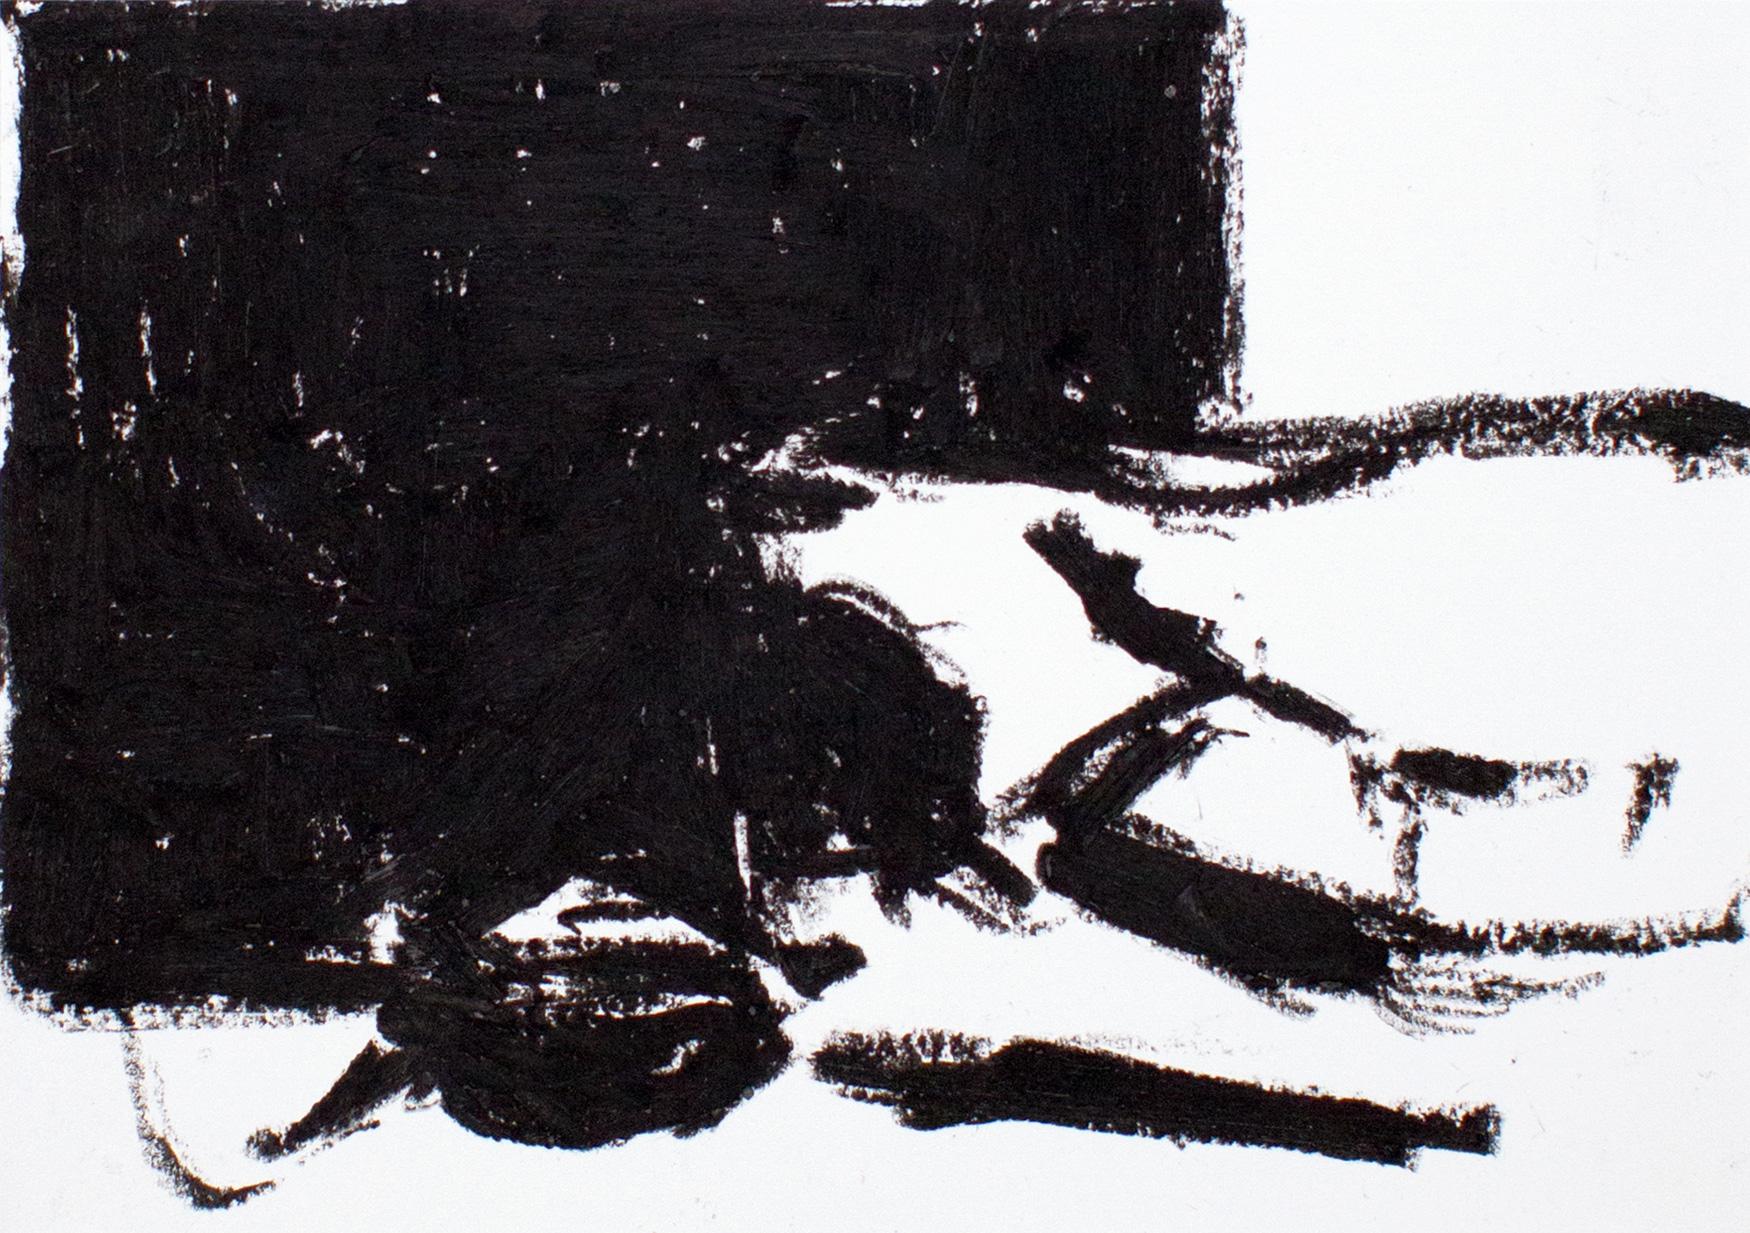 Rosengehäus', 2009 Ölkreide auf Papier 15 x 21 cm